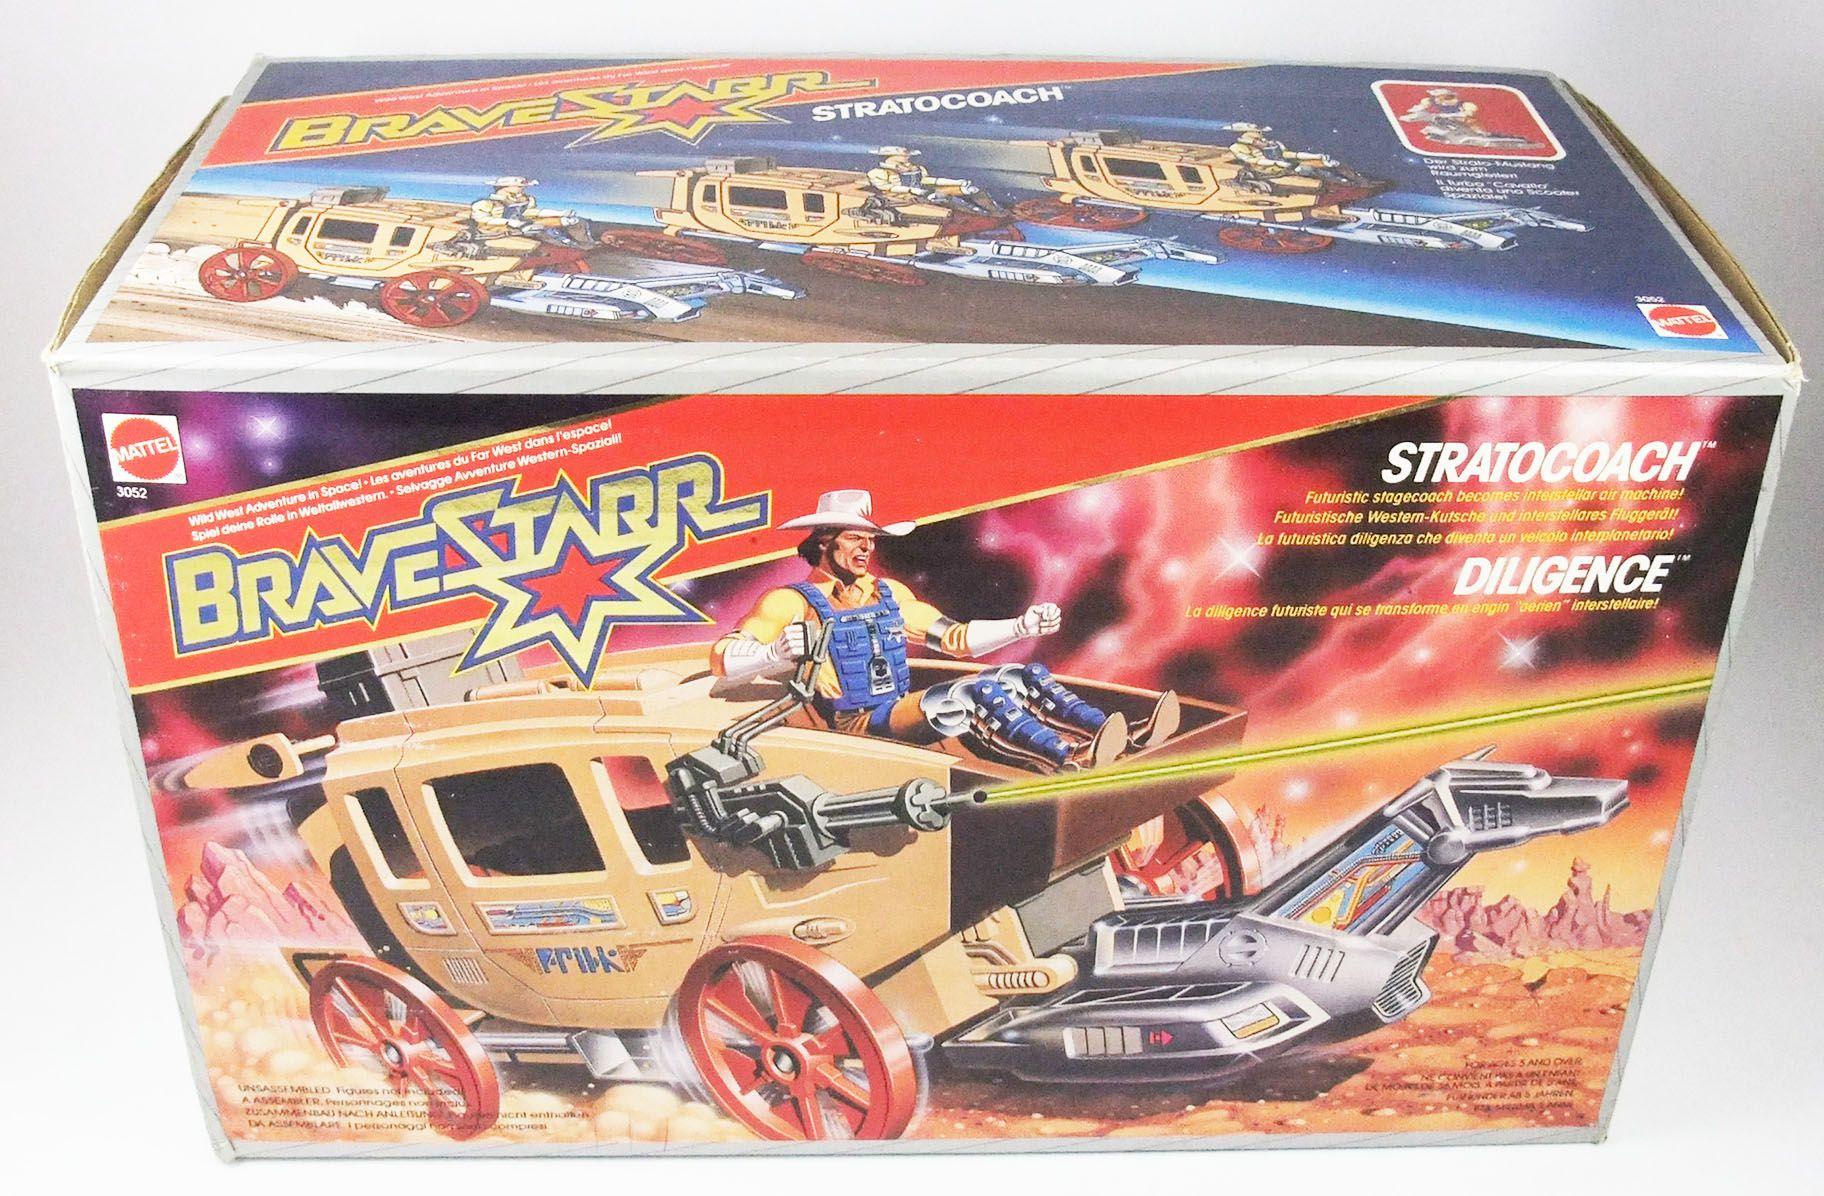 BraveStarr - Stratocoach / La Diligence